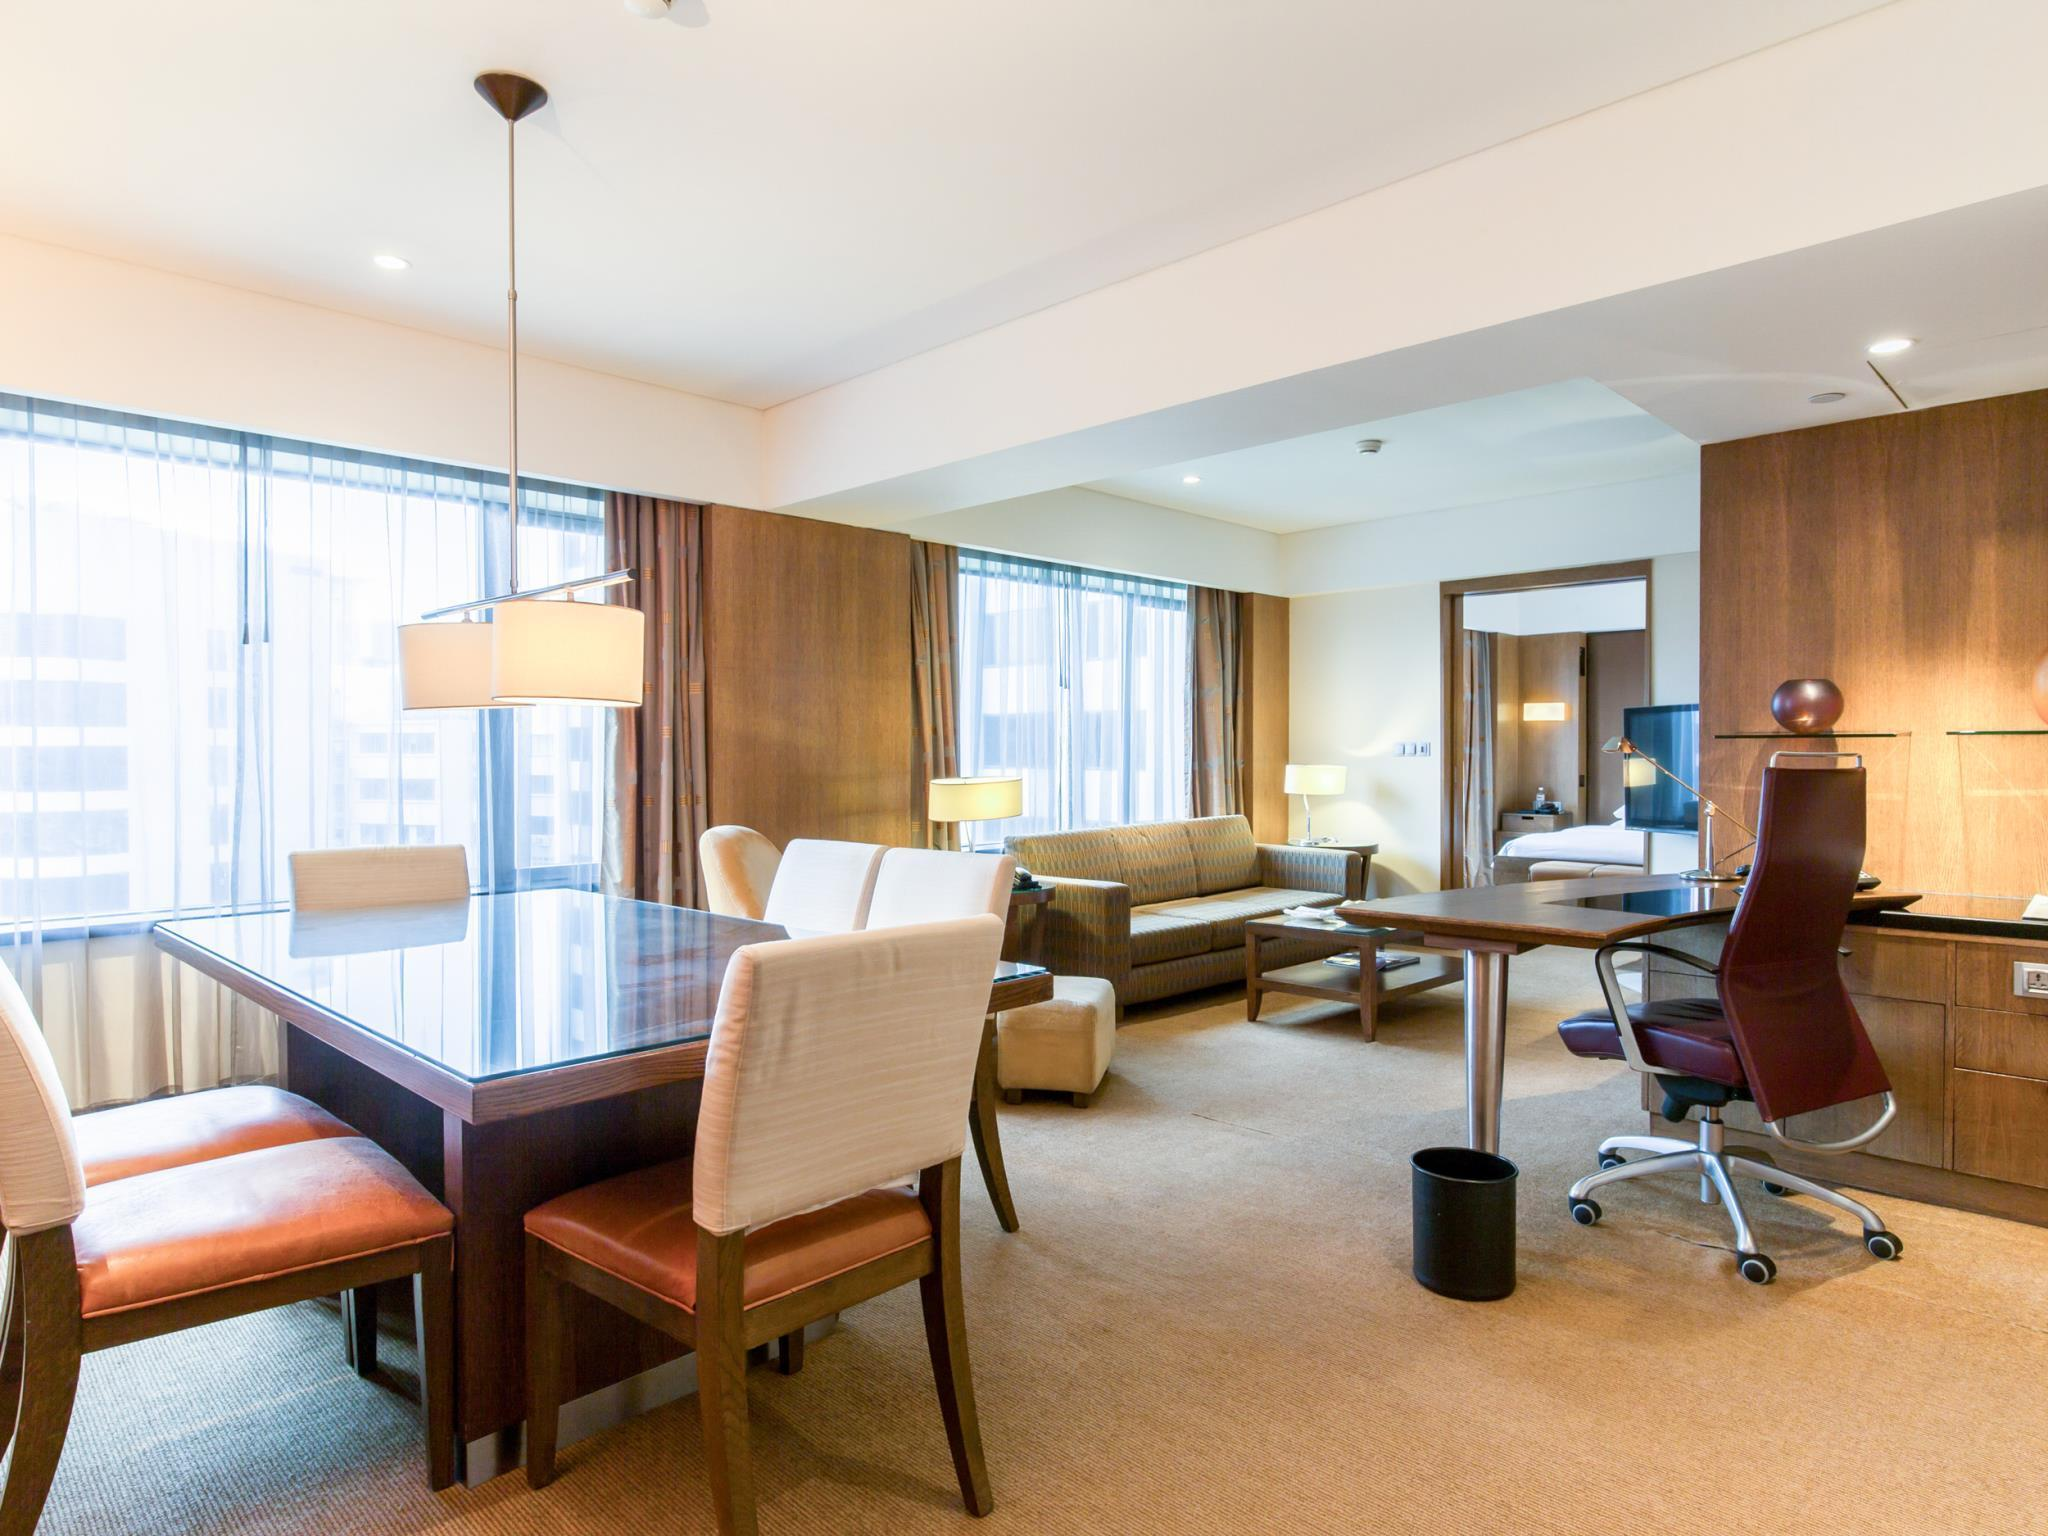 Grand hyatt singapore room deals photos reviews - 2 bedroom hotel suites singapore ...